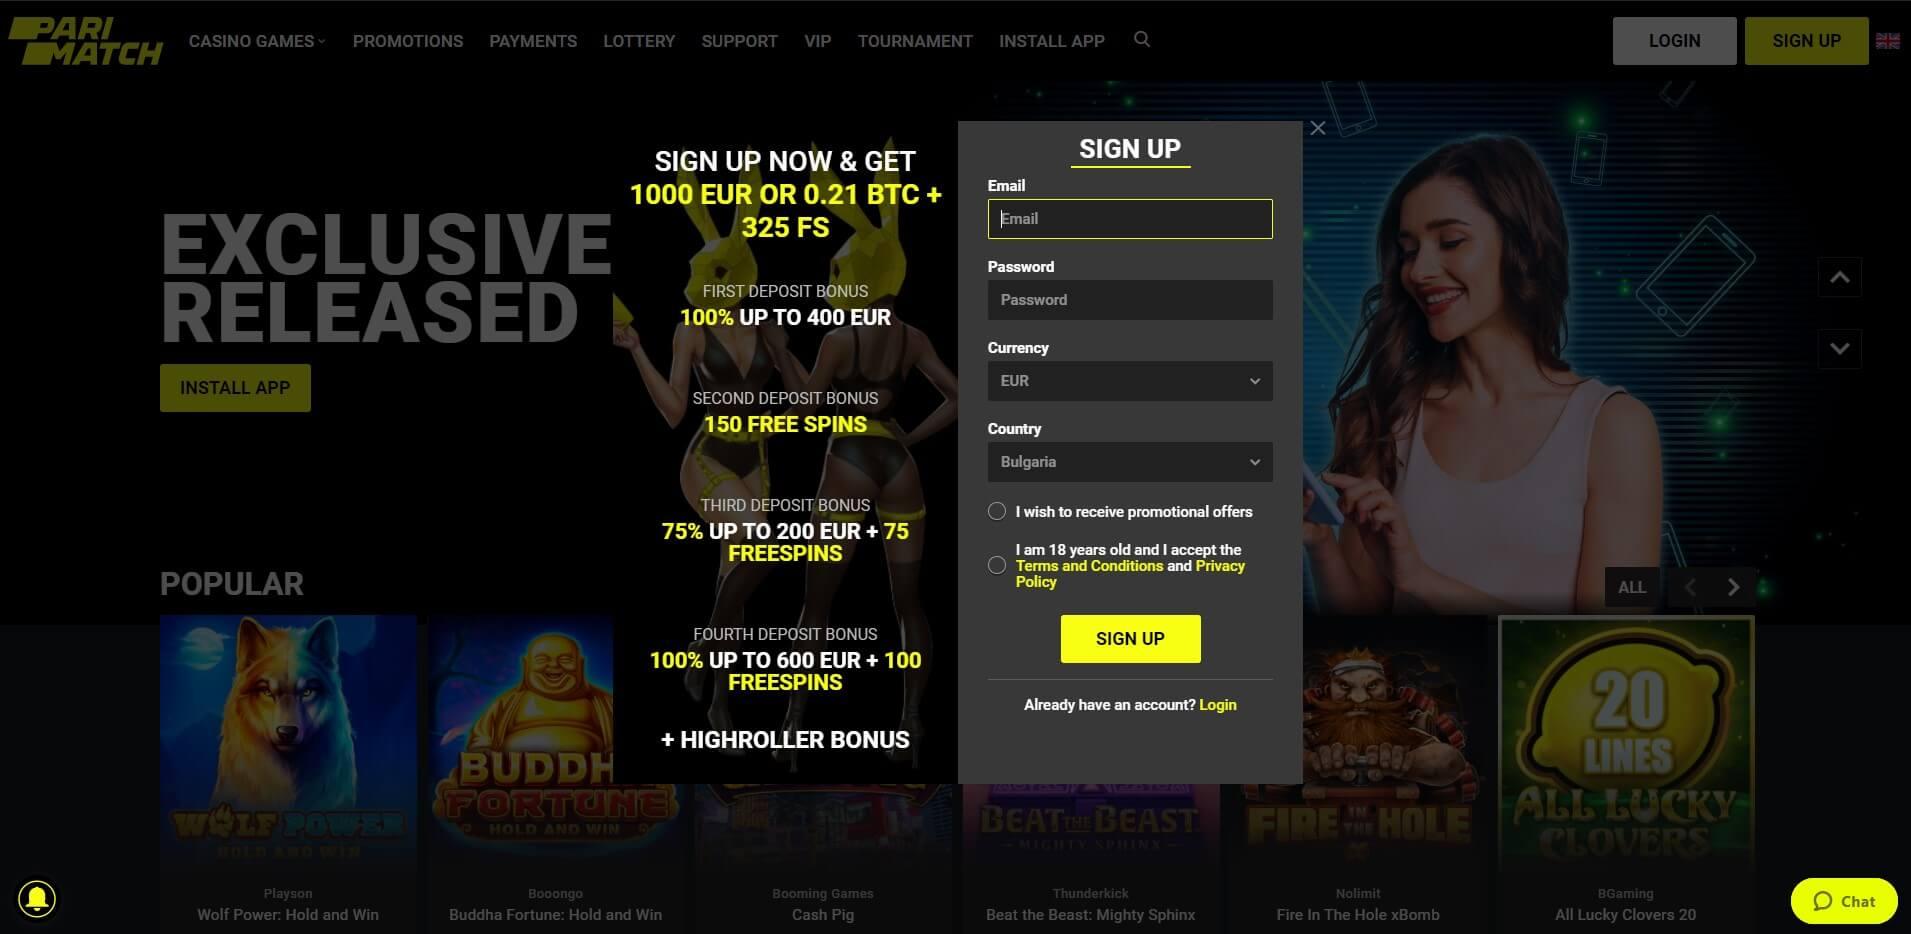 Sign Up at PariMatch Casino